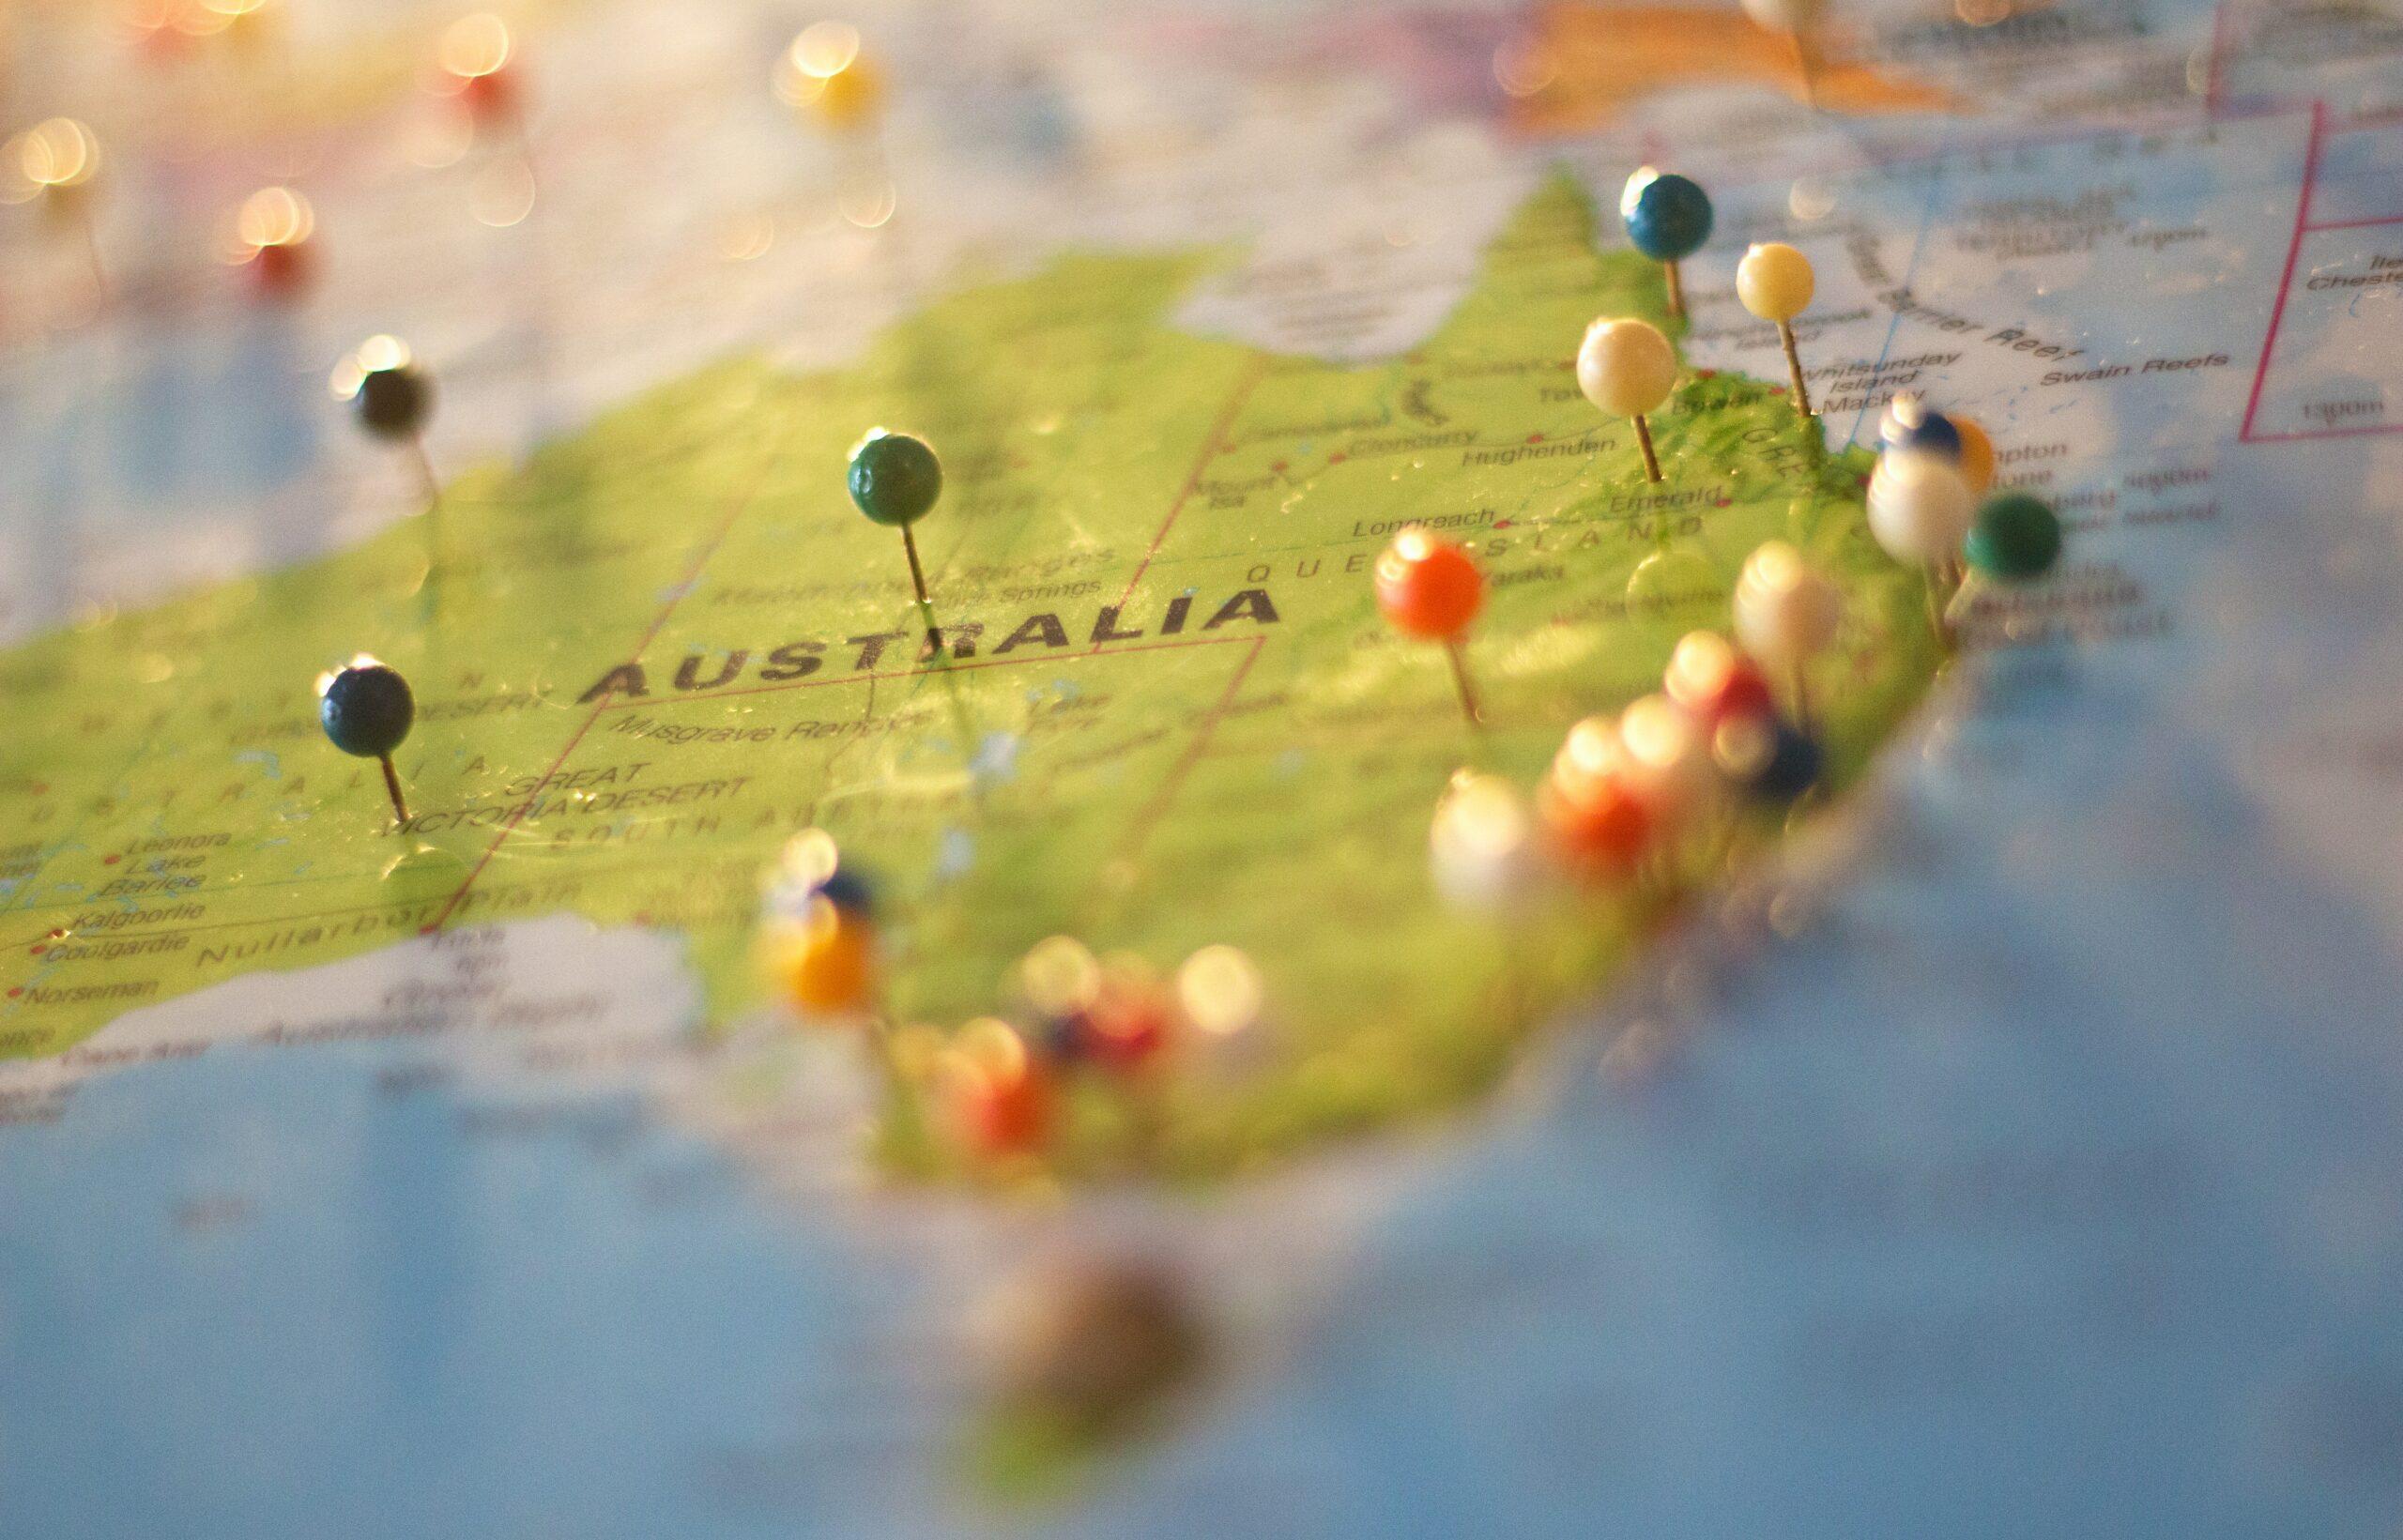 Кредит на отдых и отпуск в Украине и за границей